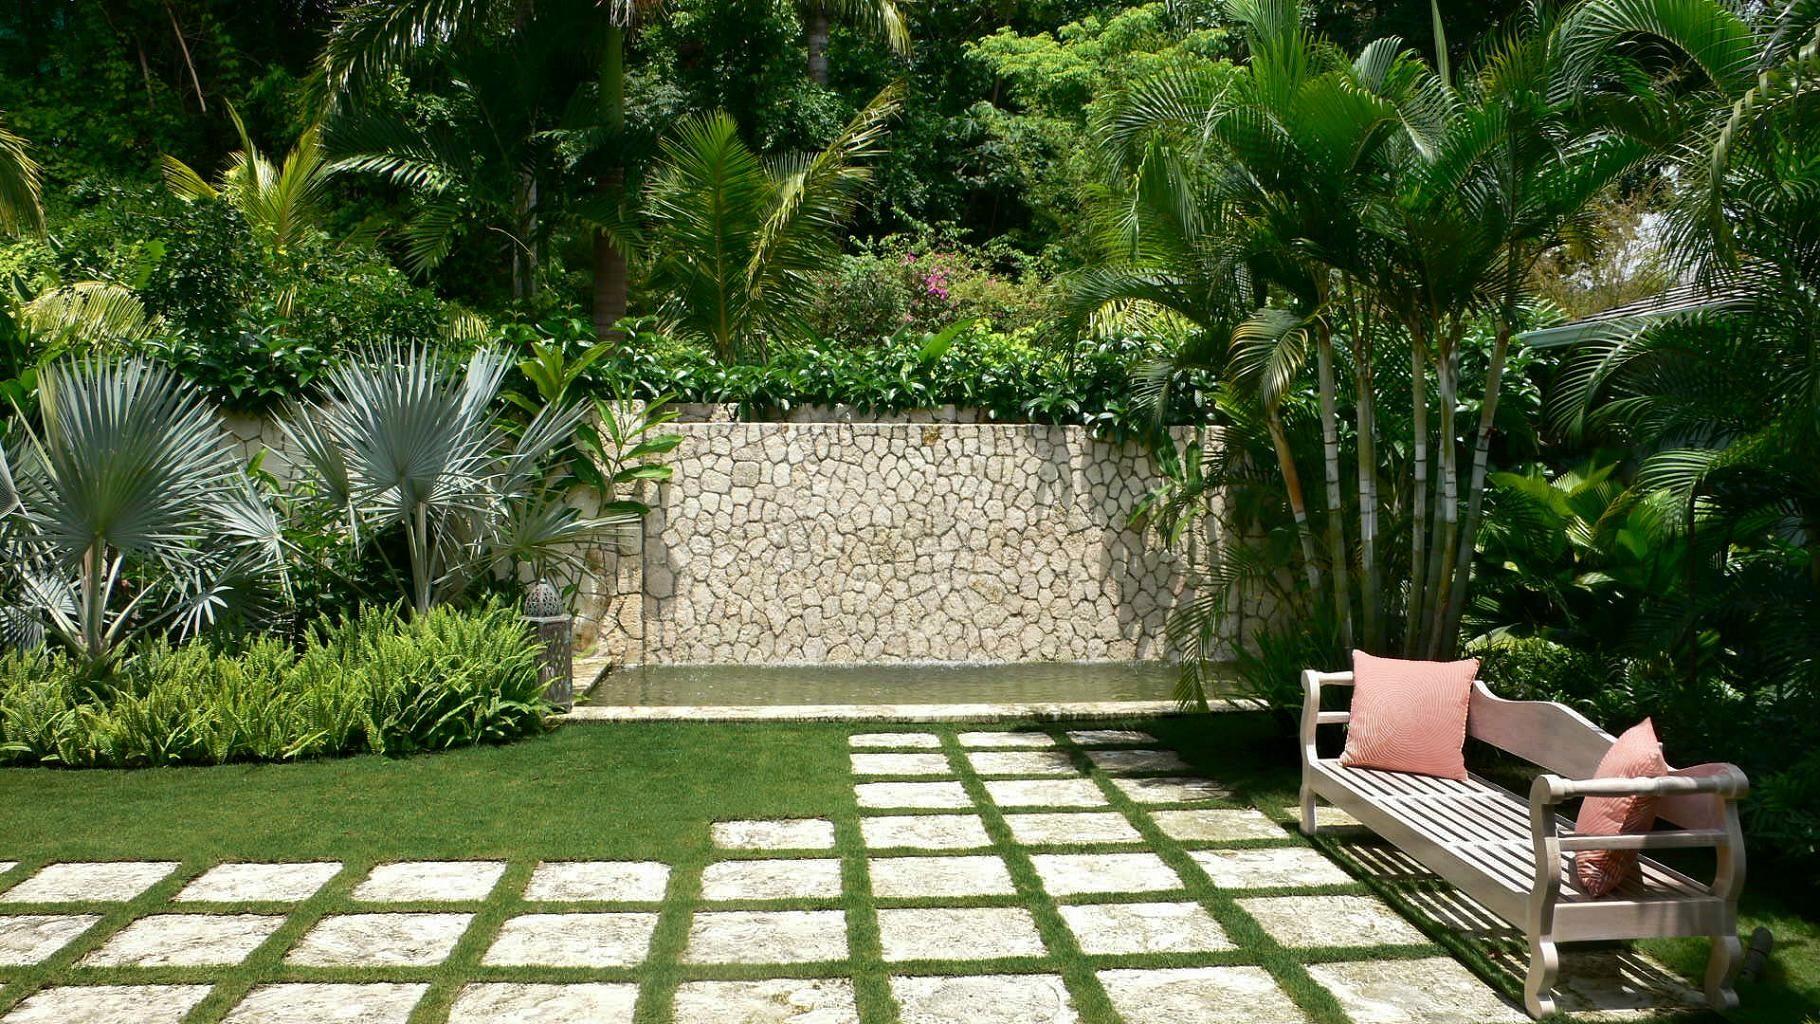 Simple garden ideas for backyard - Pretty Garden Landscapes Design Inspiration Wonderful Landscape Simple Garden Ideas Natural Stone Hedges Palm Tree Embellish